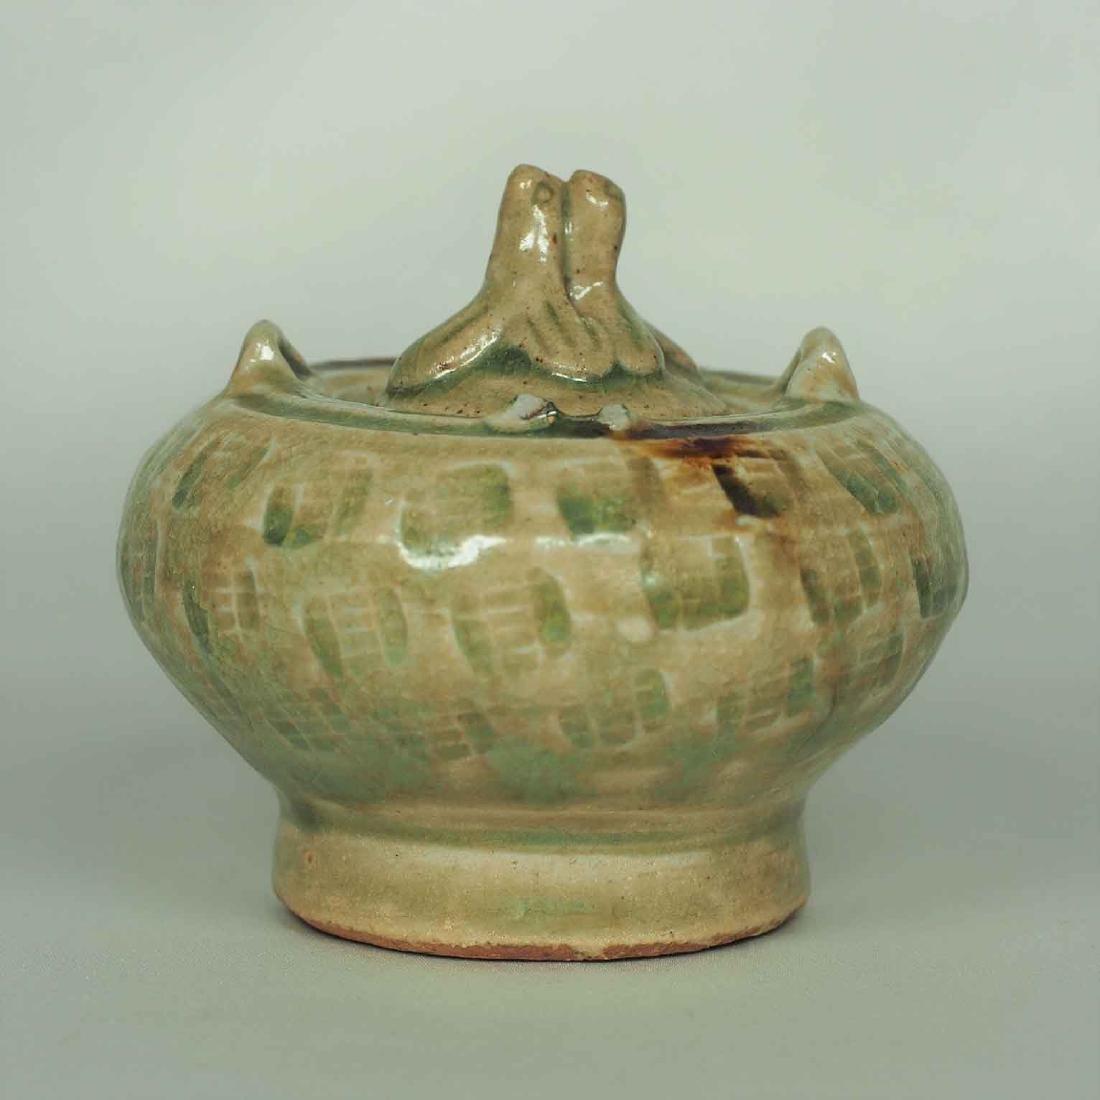 Lidded Water Pot with Brown Spot, Eastern Jin Dynasty - 2